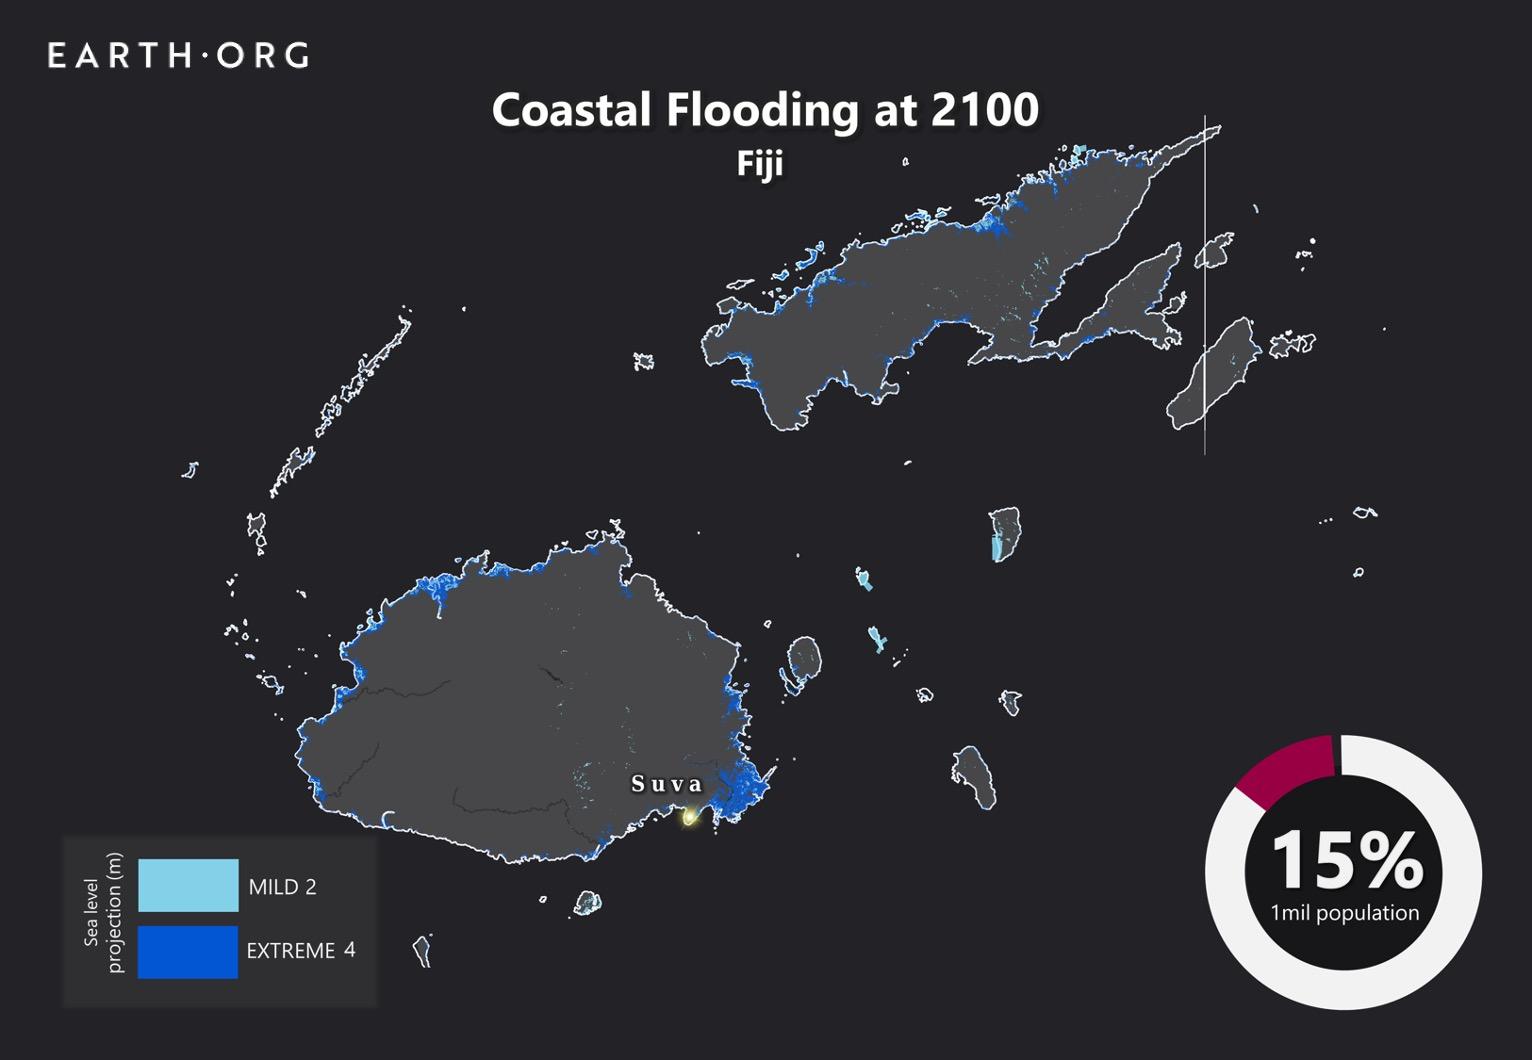 sea level rise by 2100 fiji